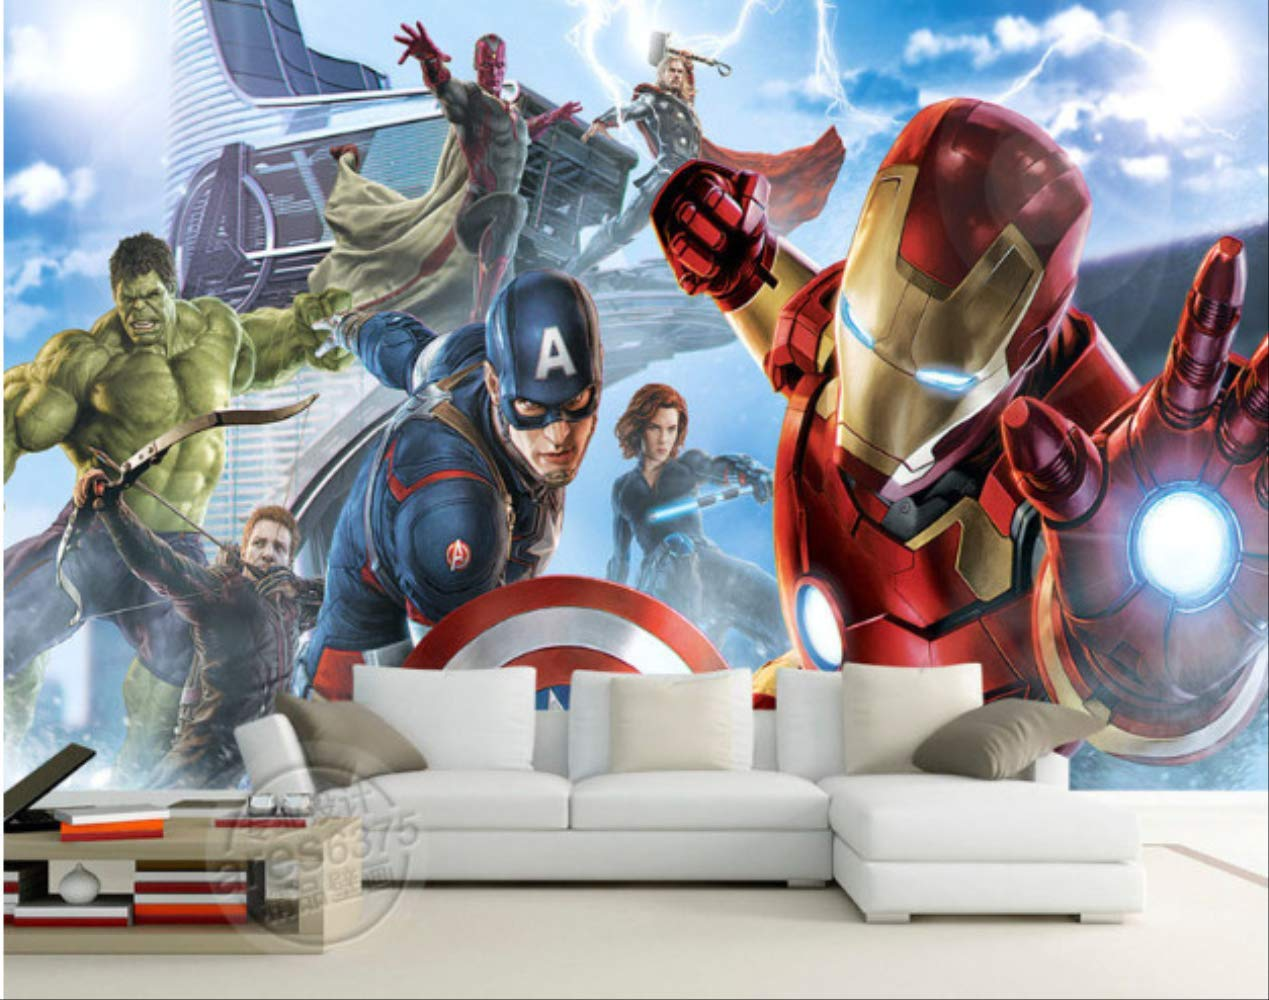 Avengers Boys Bedroom Photo Wallpaper Custom 3d Wall Murals Marvel Comics Wallpaper Childrens Room Interior Design Room D/écor Largeur 250cm Hauteur175cm un